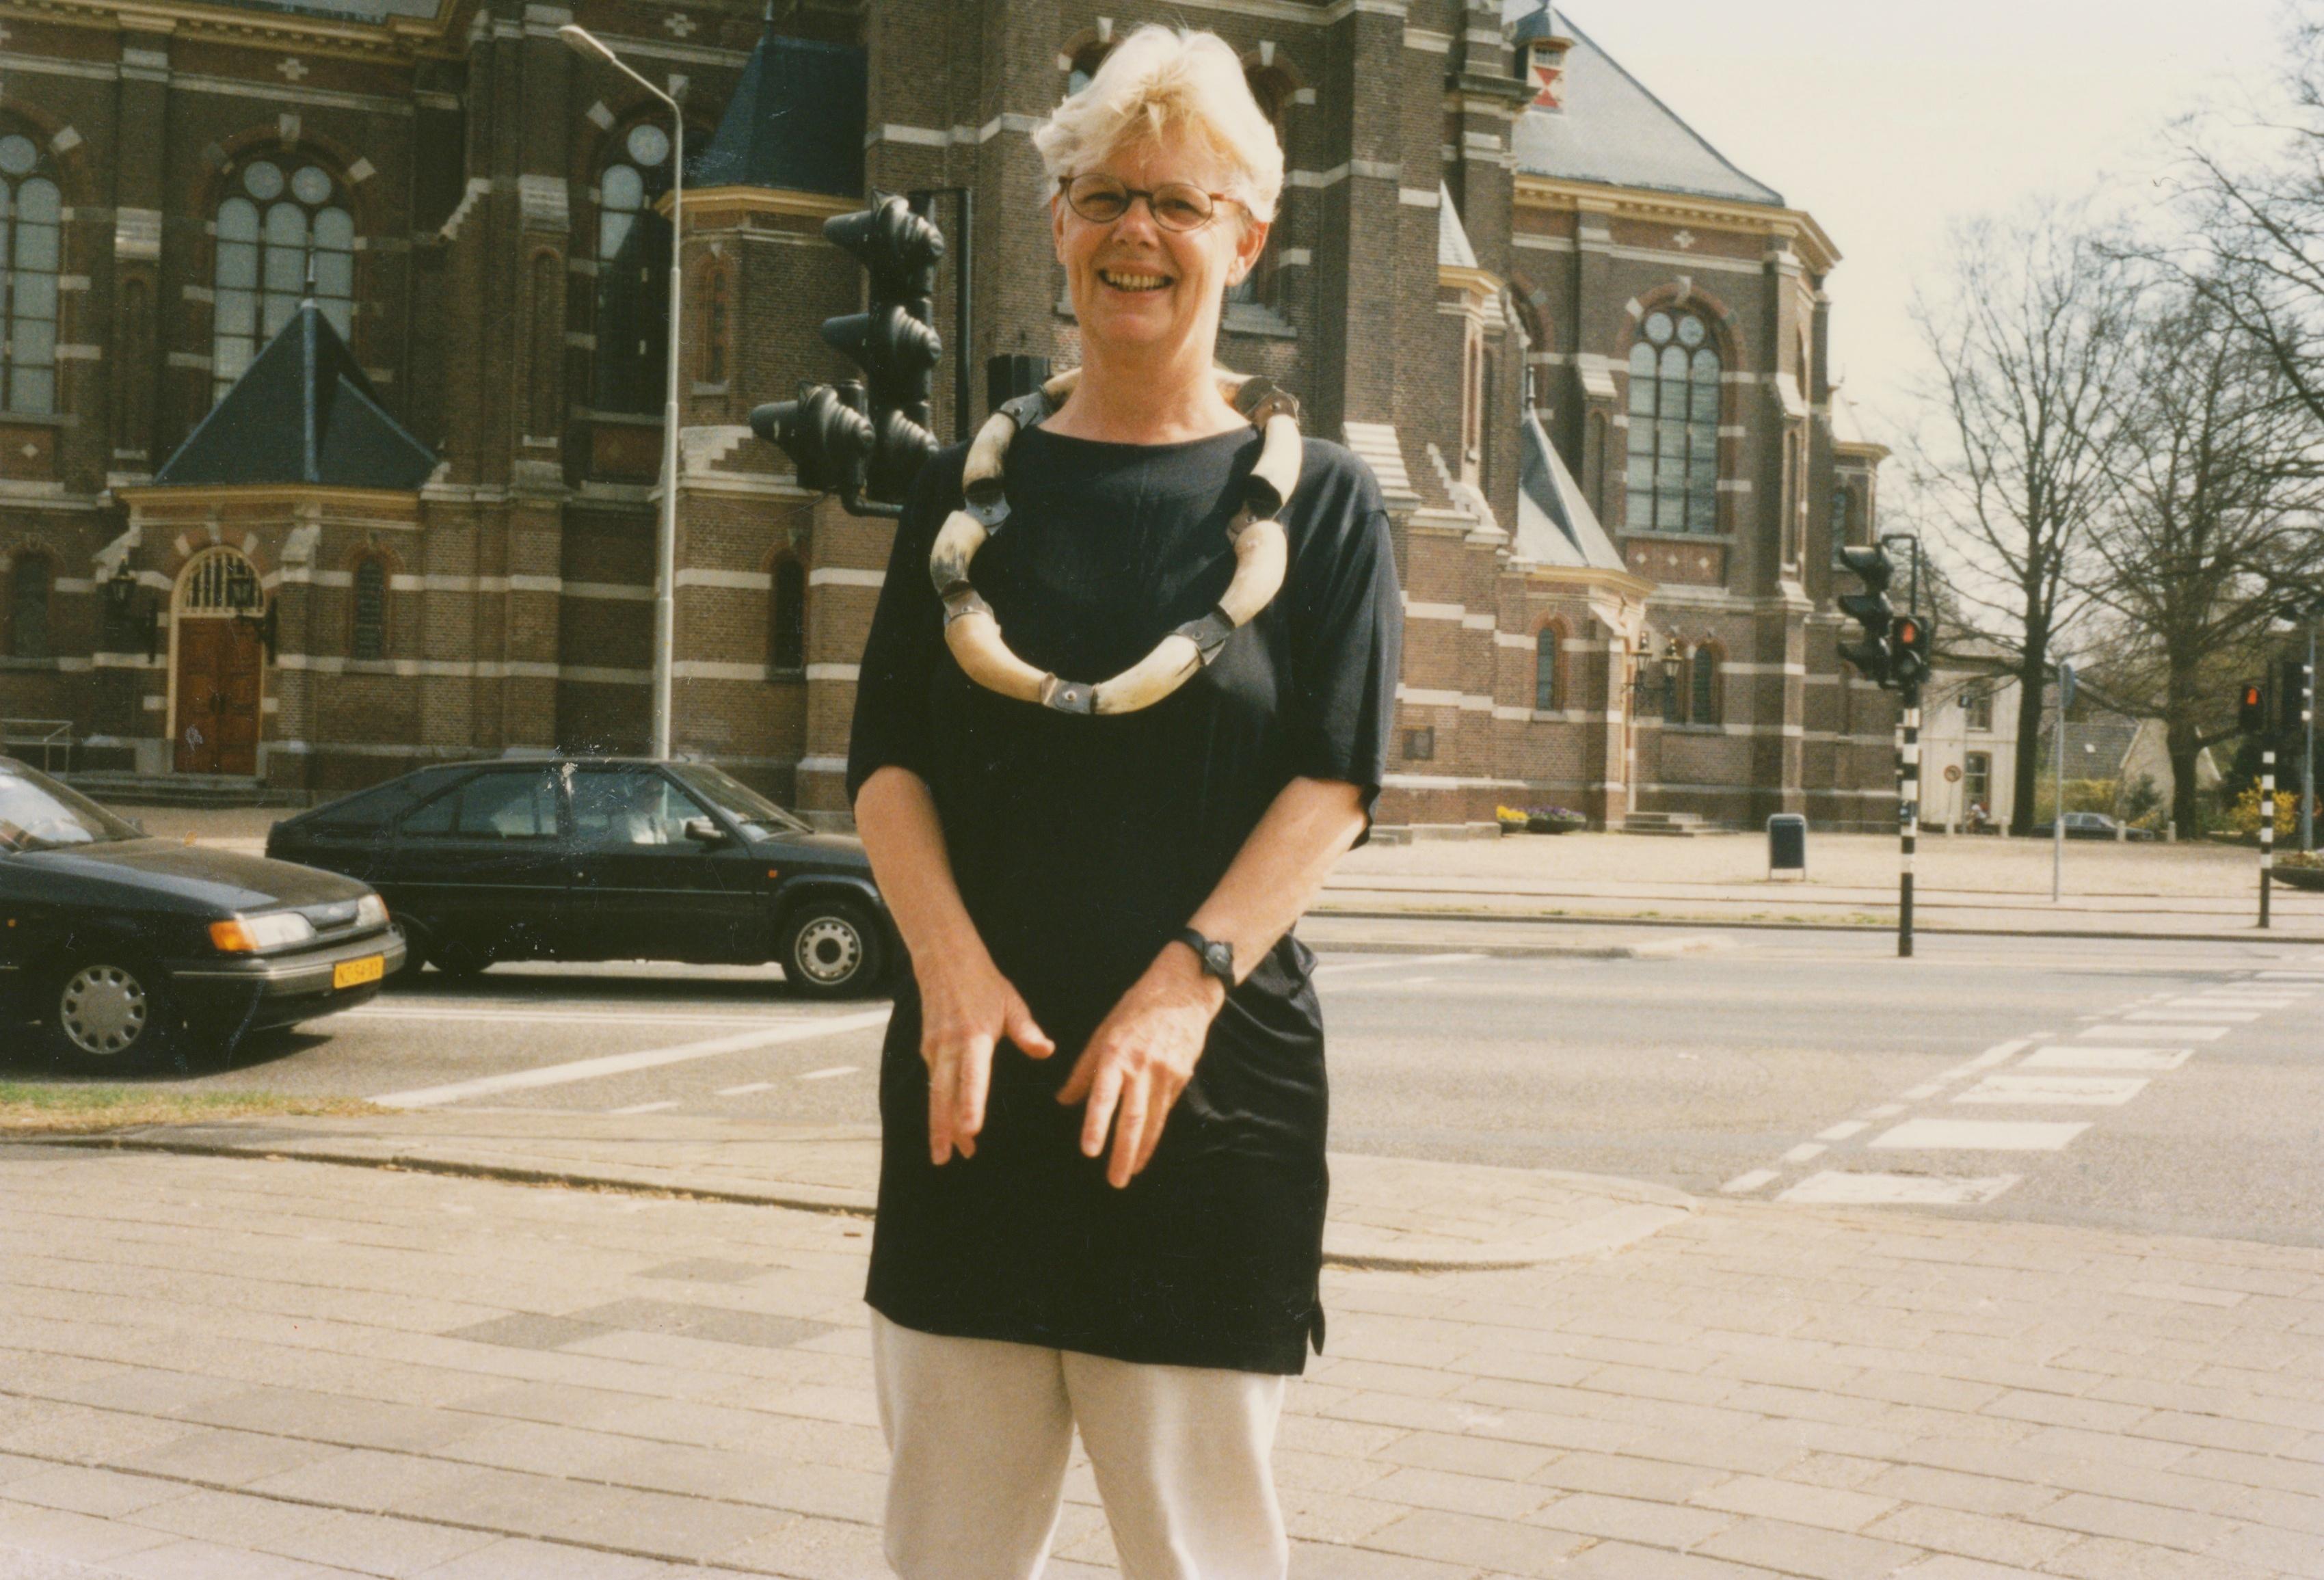 Claartje Keur, Zelfportret met halssieraad van Carel Visser, Apeldoorn, Grote Kerk, 22 april 1996. Foto Claartje Keur